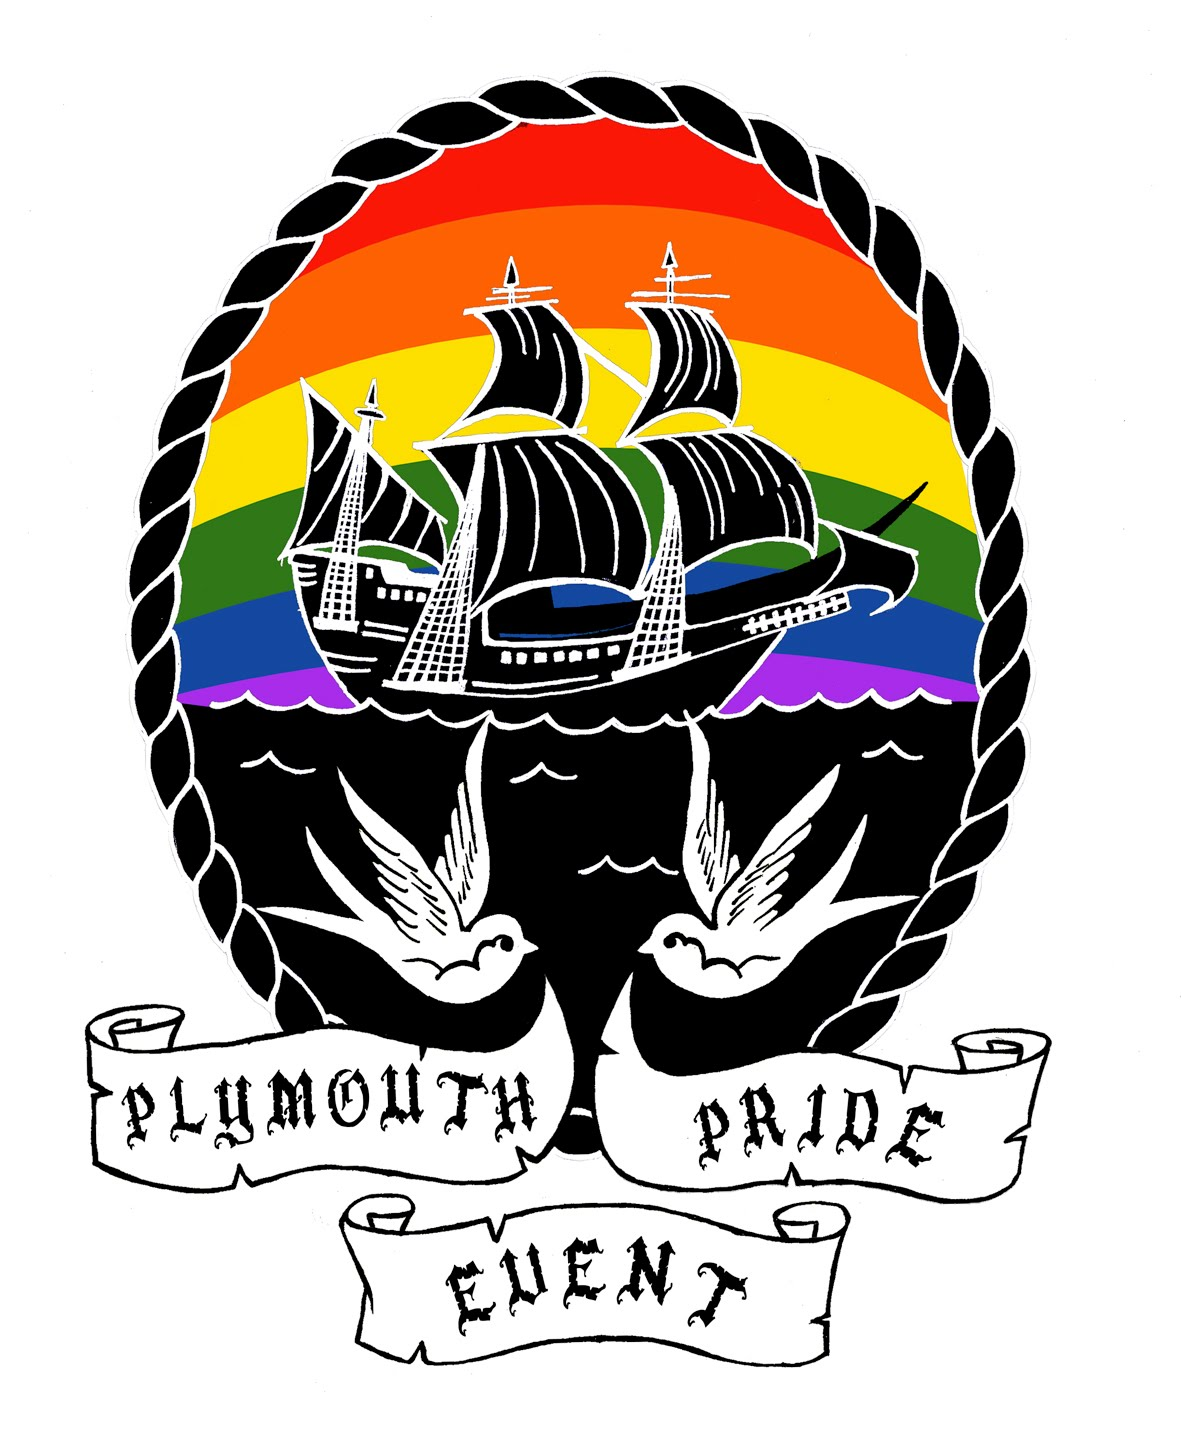 from Grayson gay logo